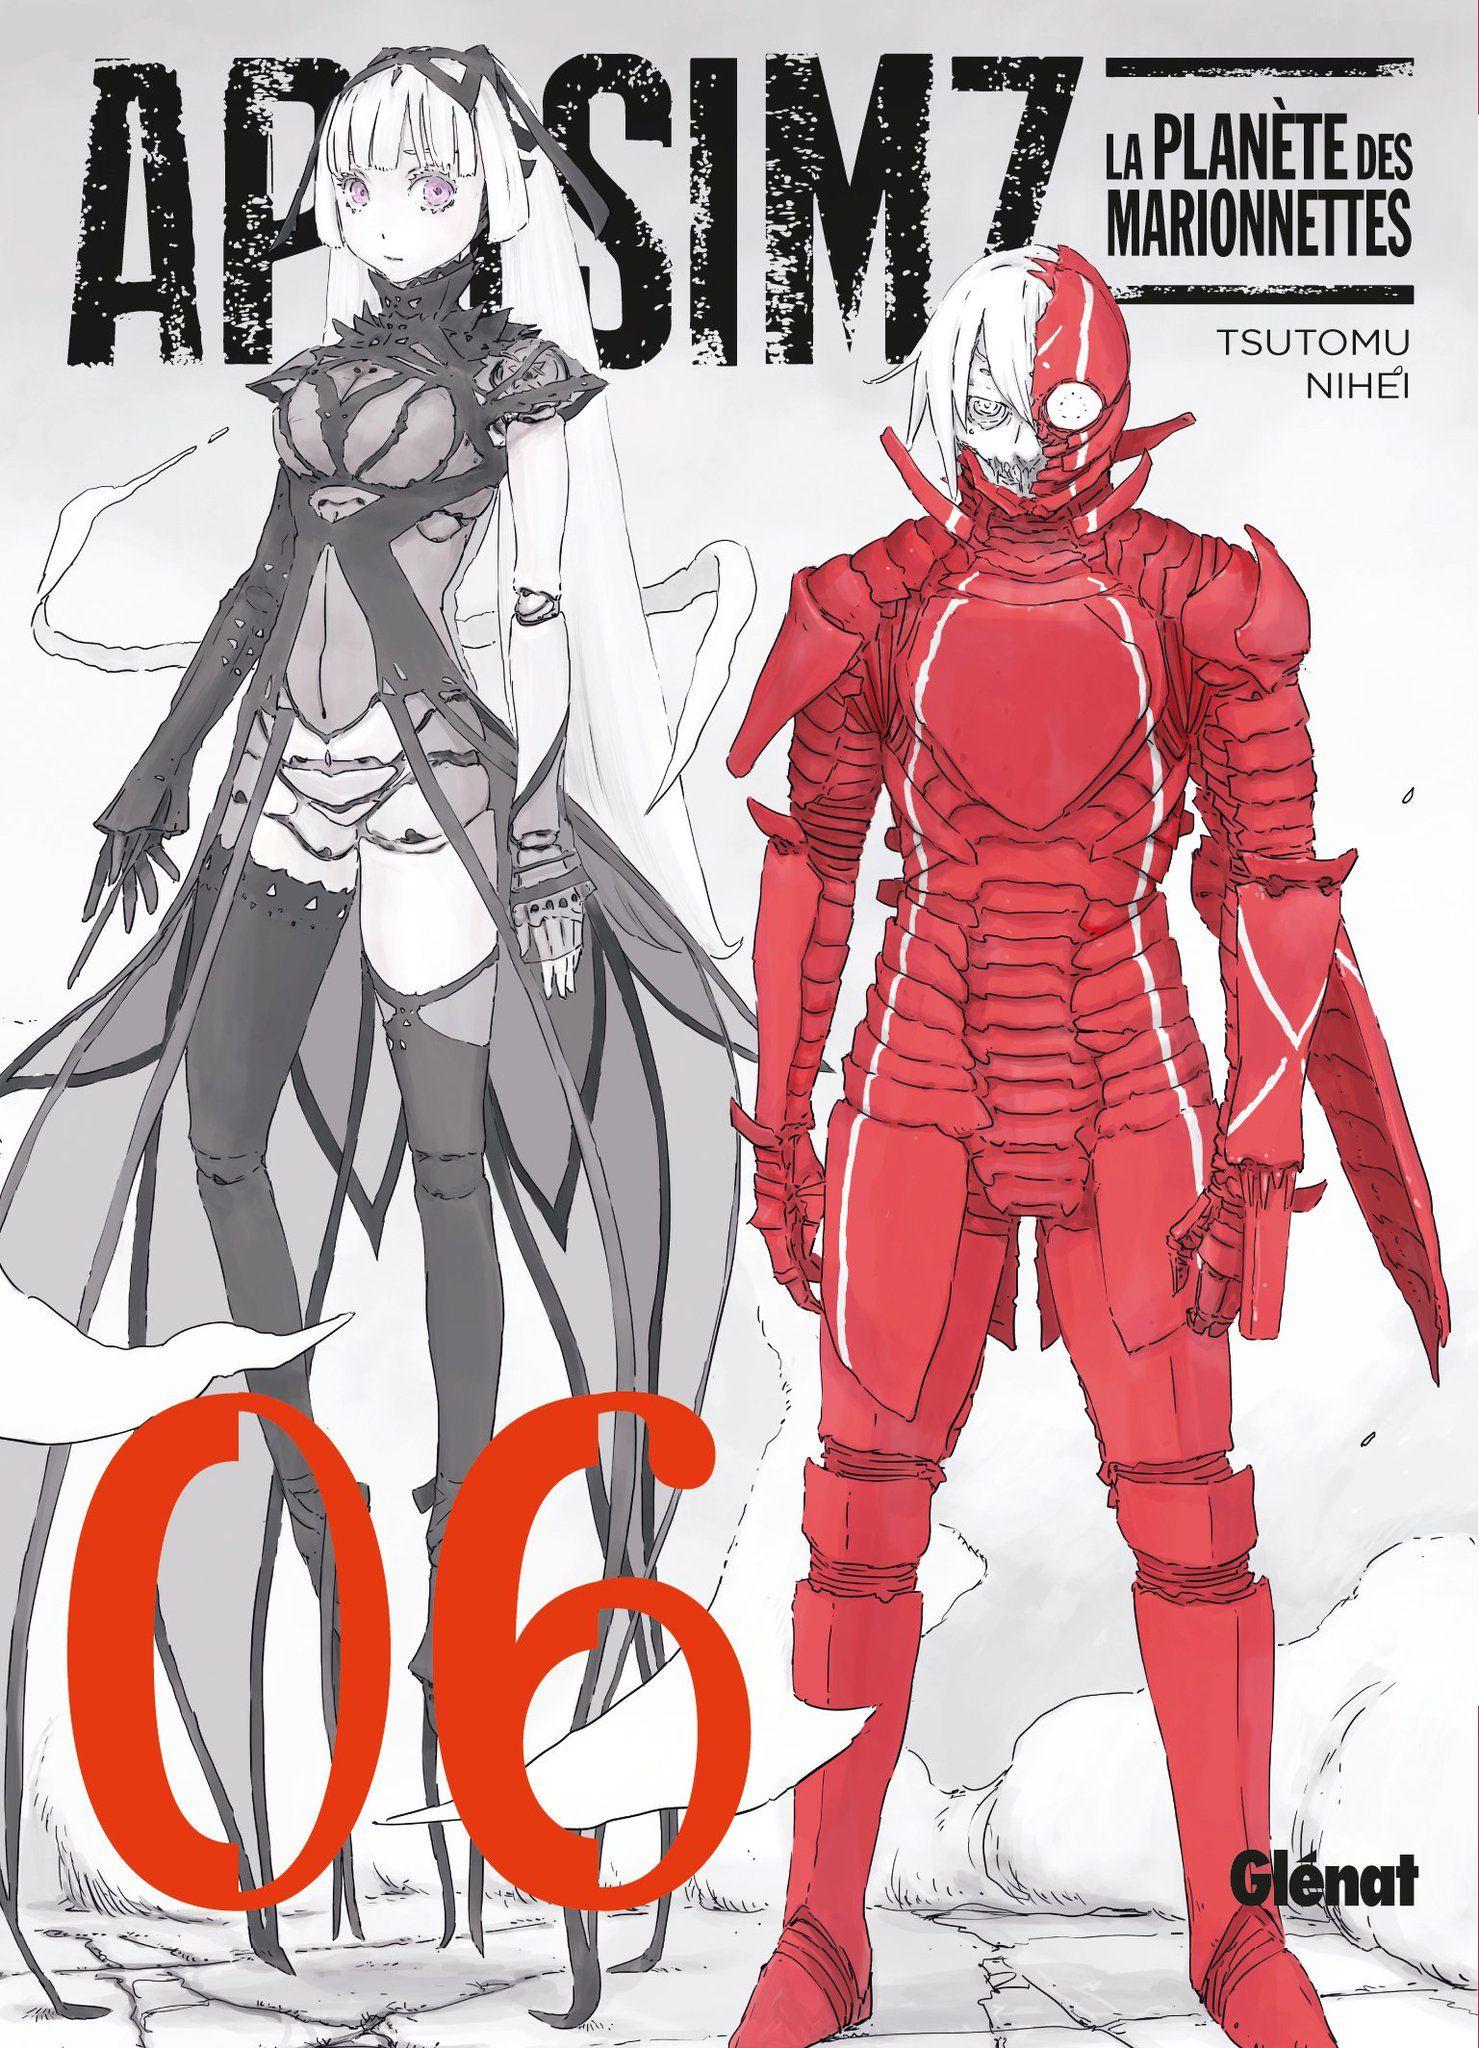 Sortie Manga au Québec JUIN 2021 Aposimz-6-glenat